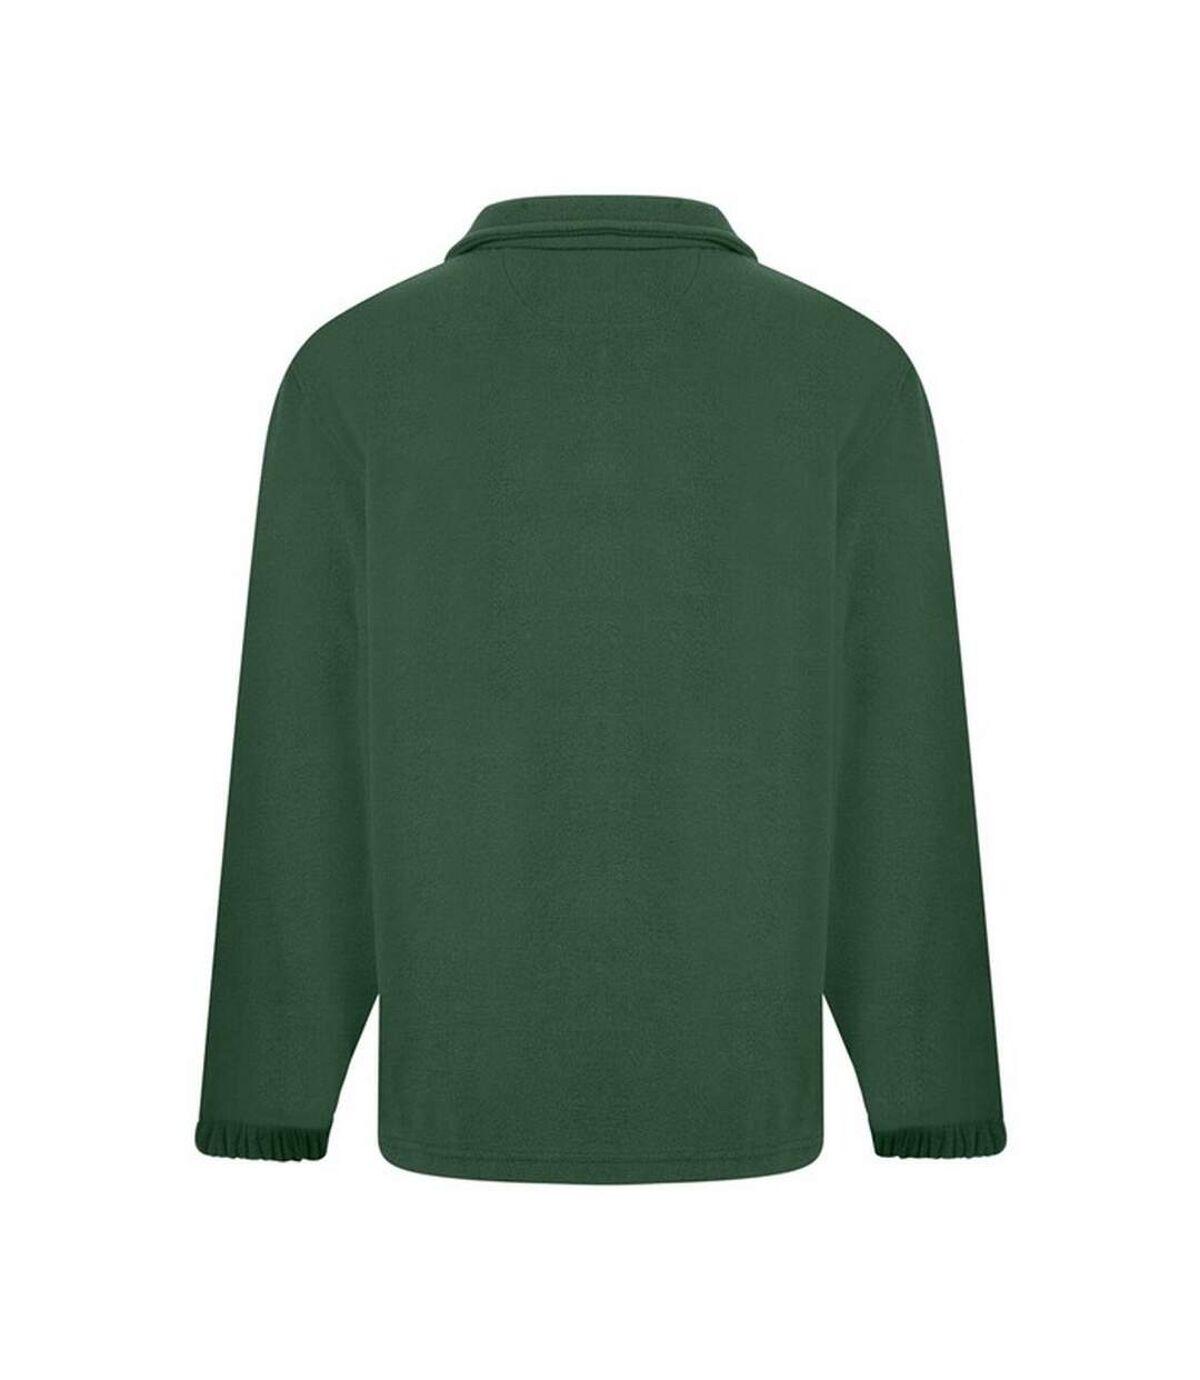 Absolute Apparel - Polaire zippée HERITAGE - Homme (Vert foncé) - UTAB128